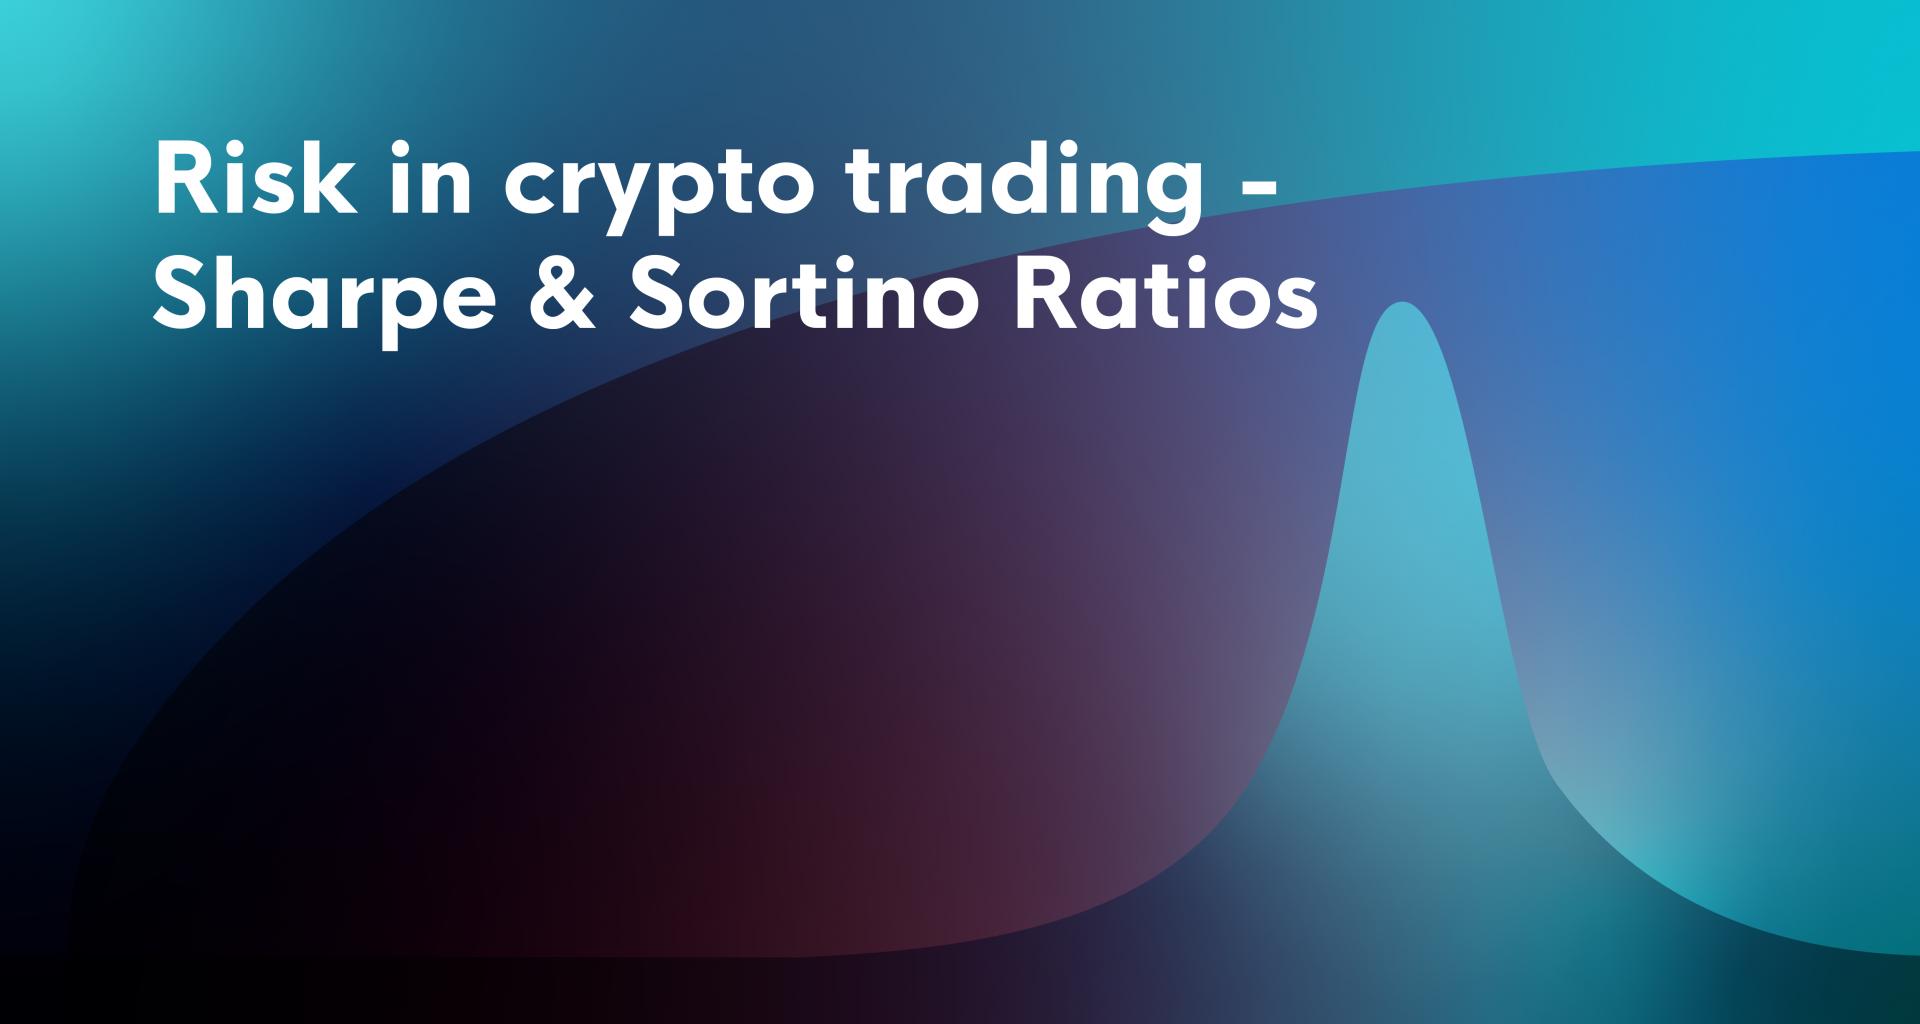 Risk in crypto trading - Sharpe & Sortino Ratios